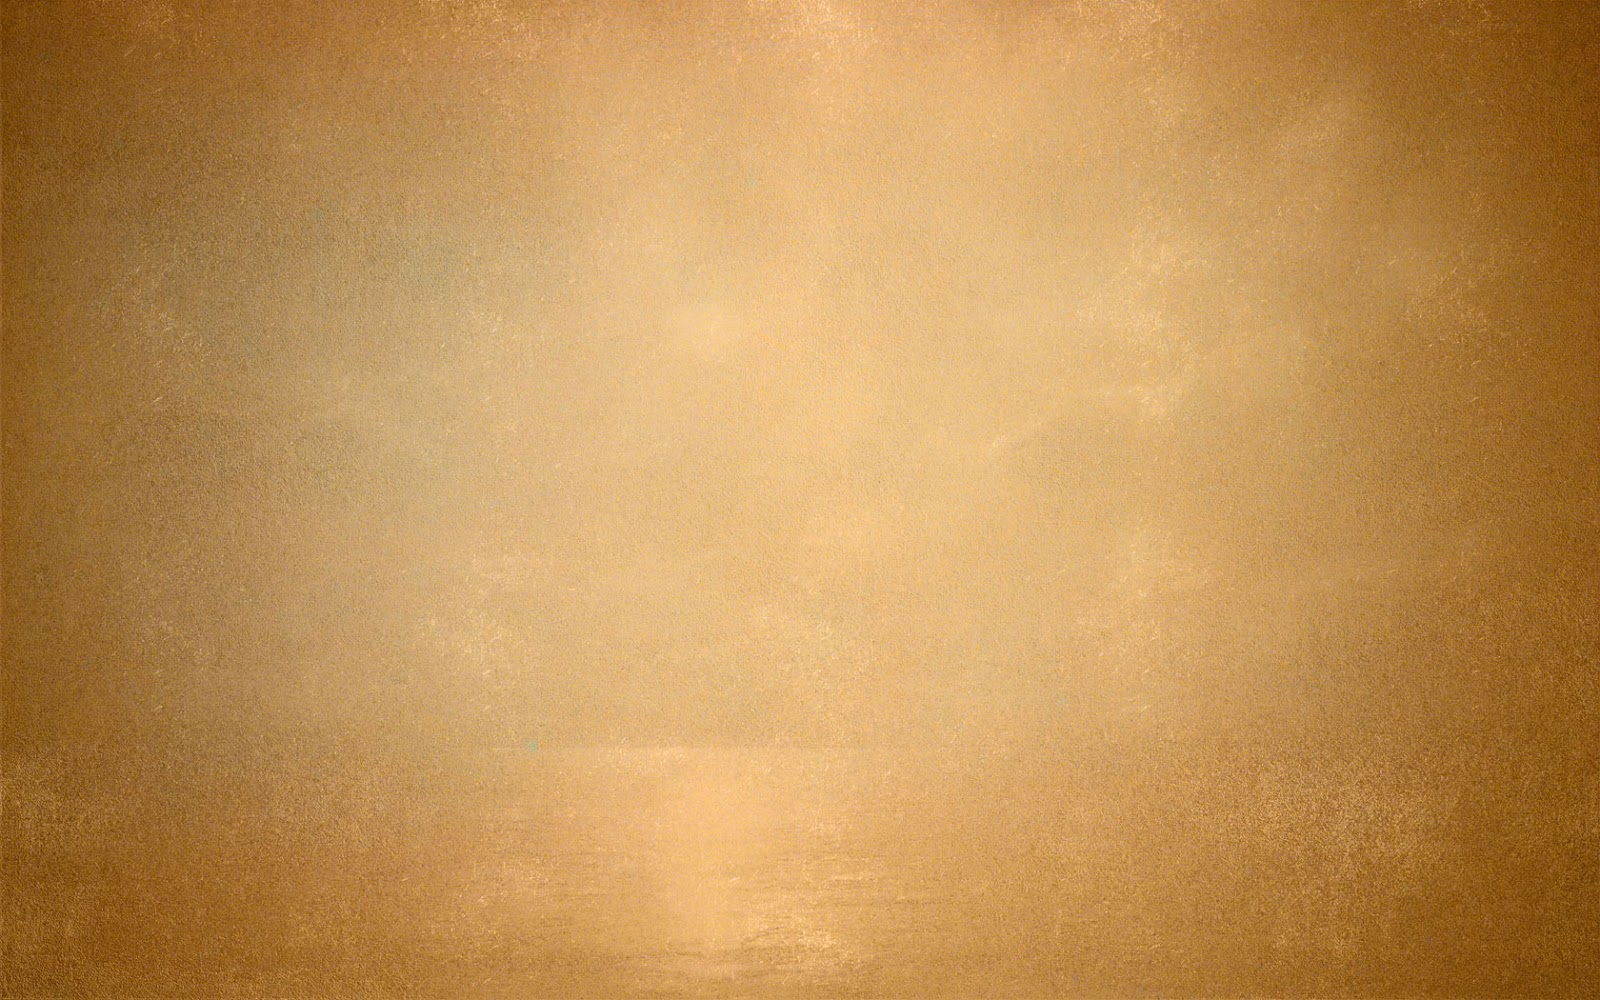 gold satin background - photo #10